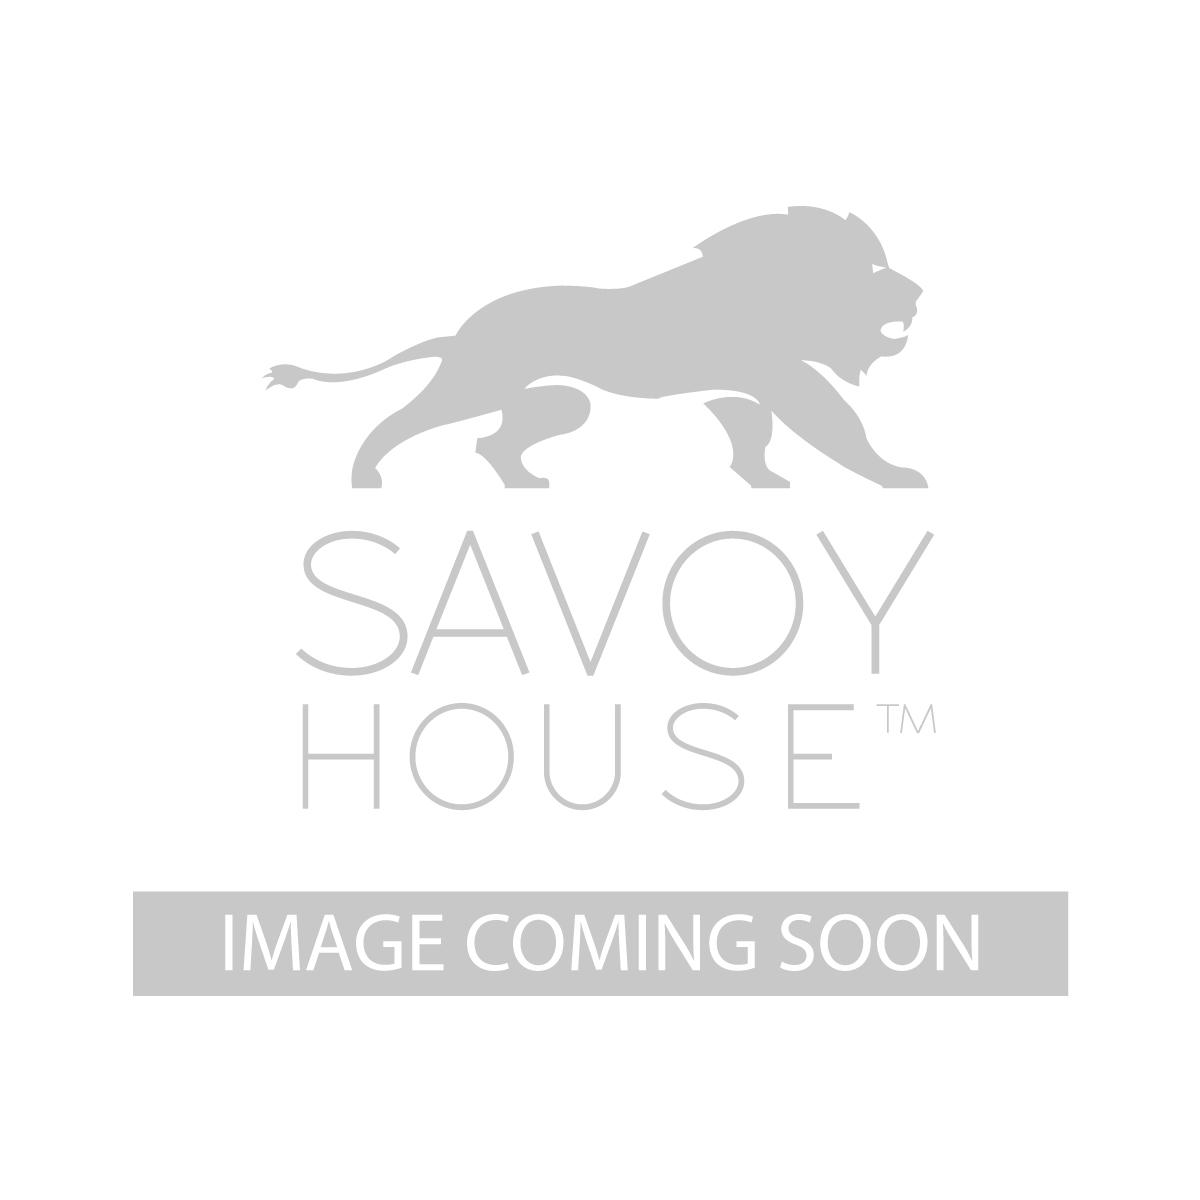 3 822 5 212 berlin 5 light foyer by savoy house for Www savoyhouse com